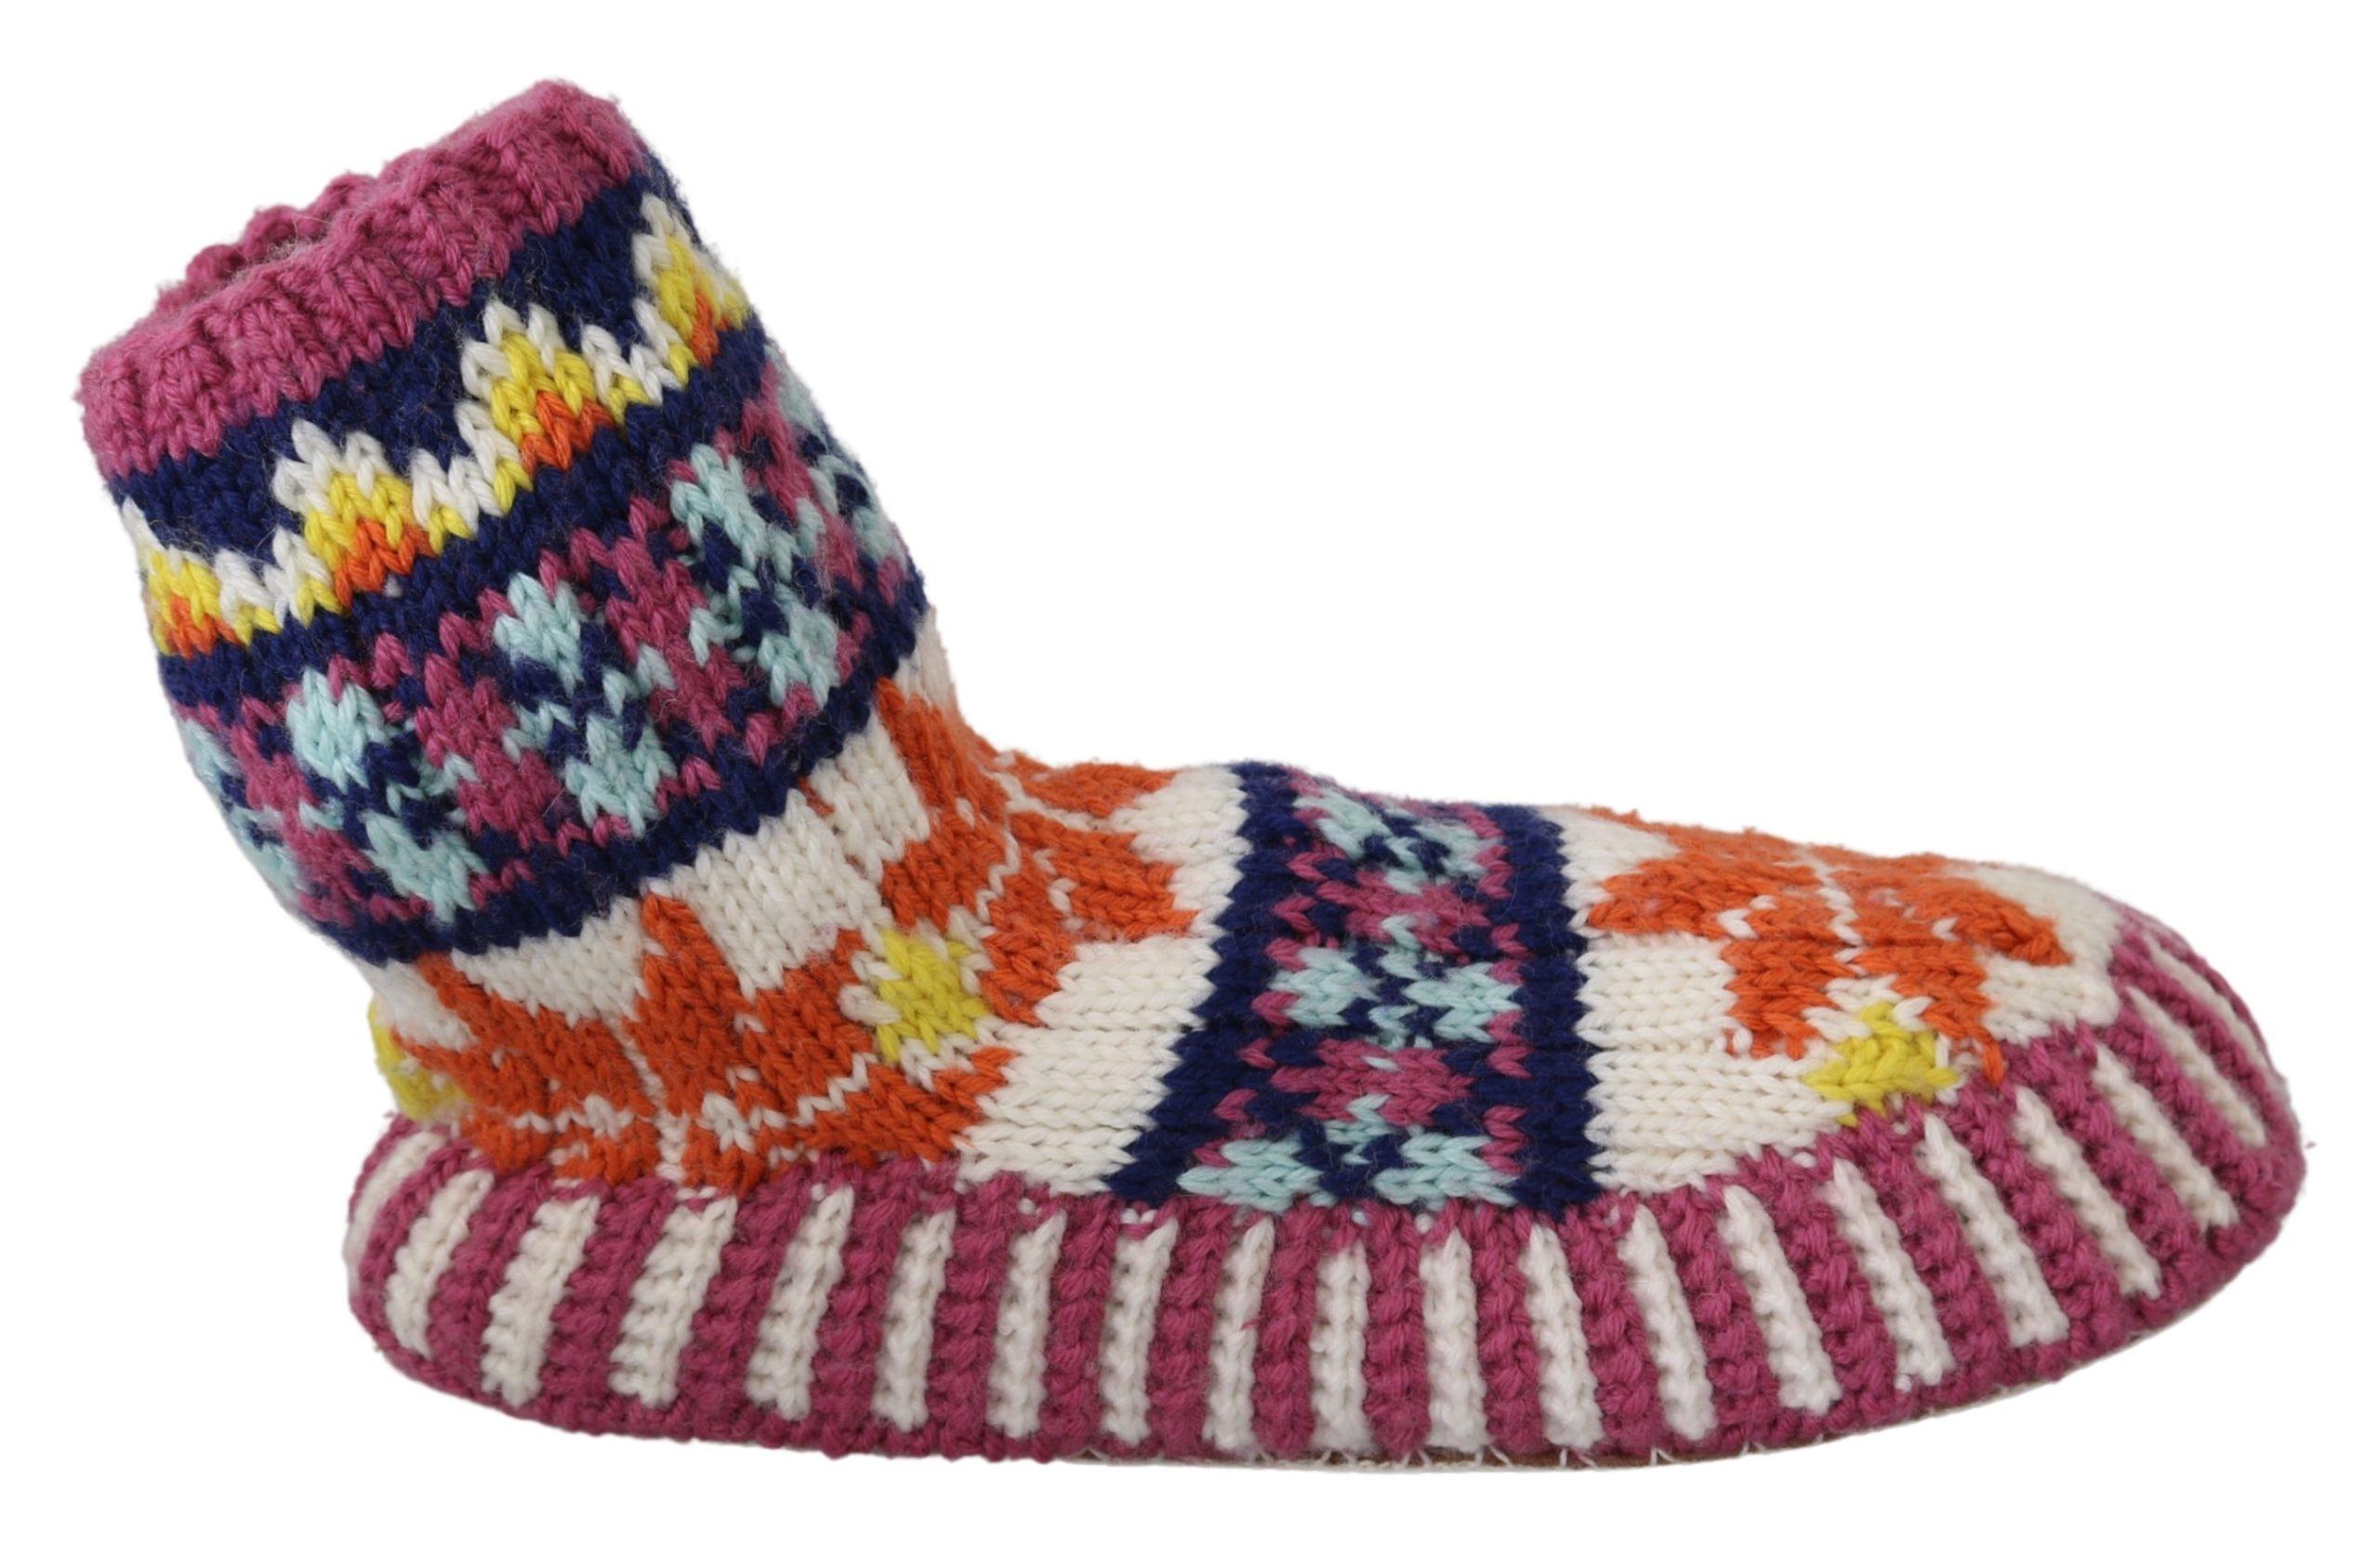 Dolce & Gabbana Women's Knitted Boots Multicolor LA6892 - EU39/US8.5